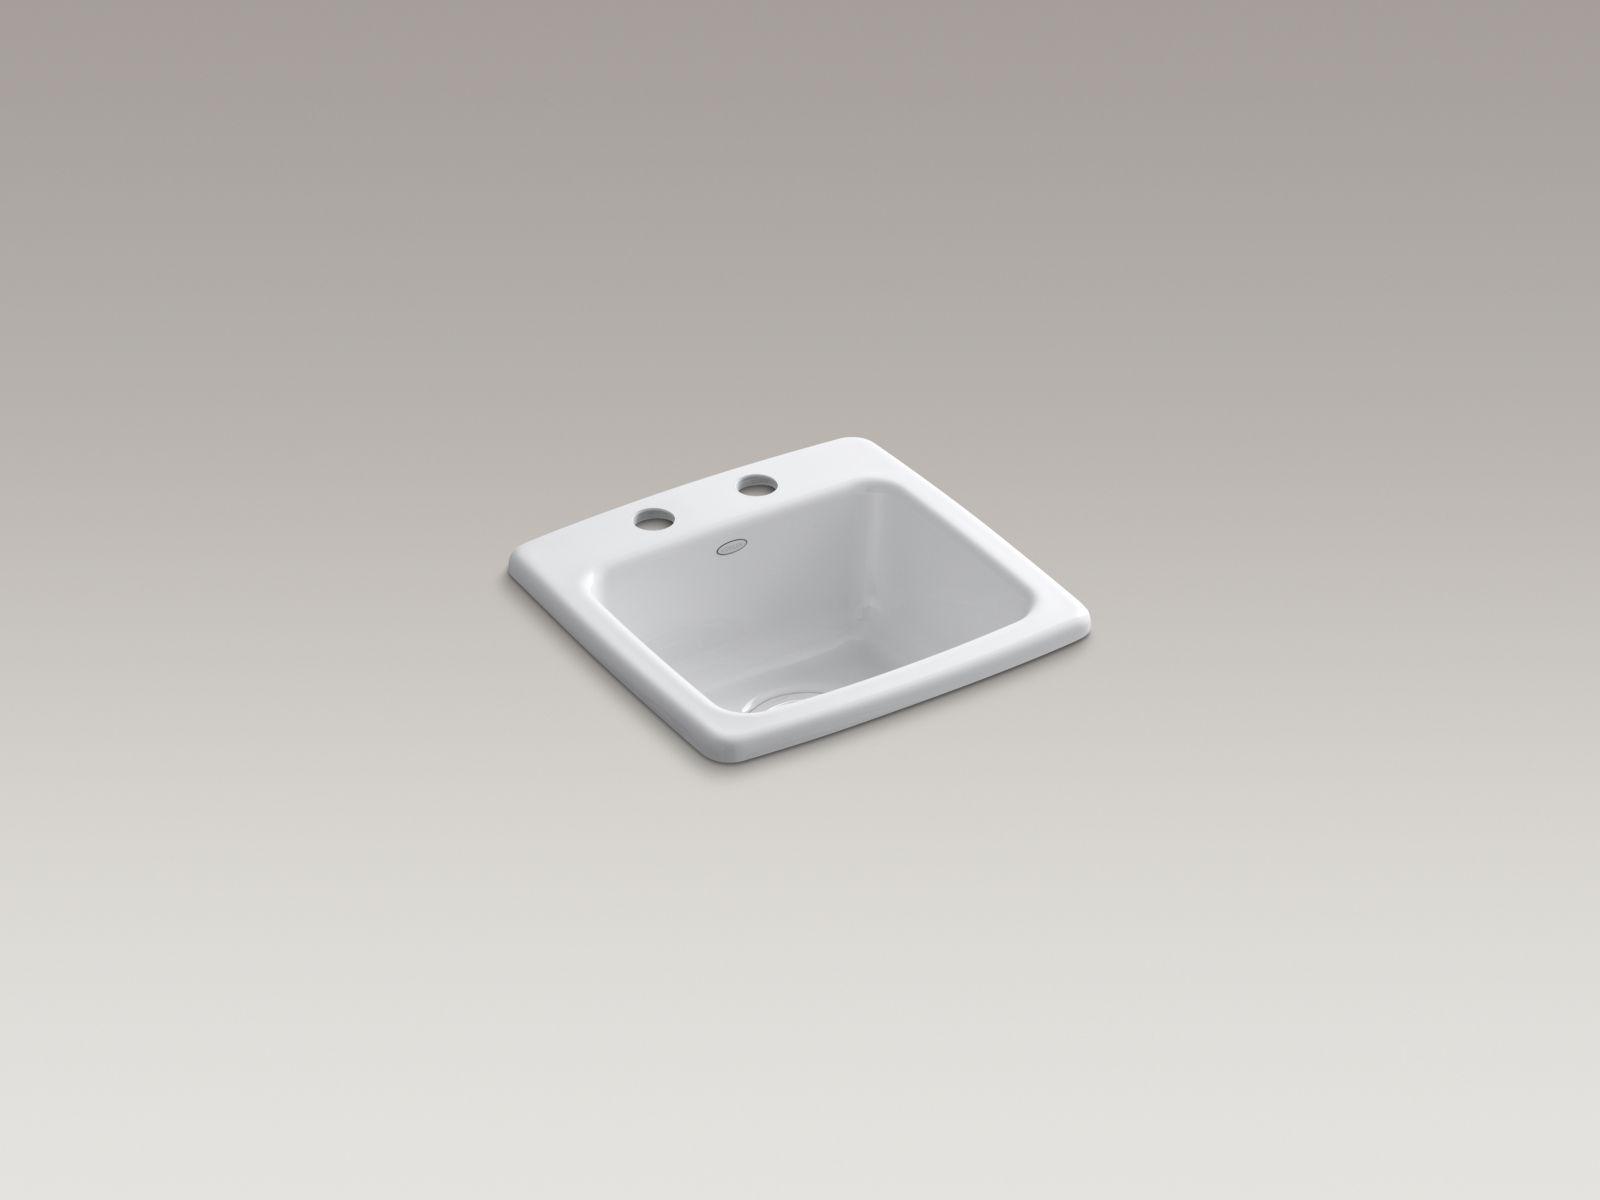 Kohler K-6015-2-0 Gimlet Self-rimming Single-bowl Bar Sink with 2 Faucet Holes White